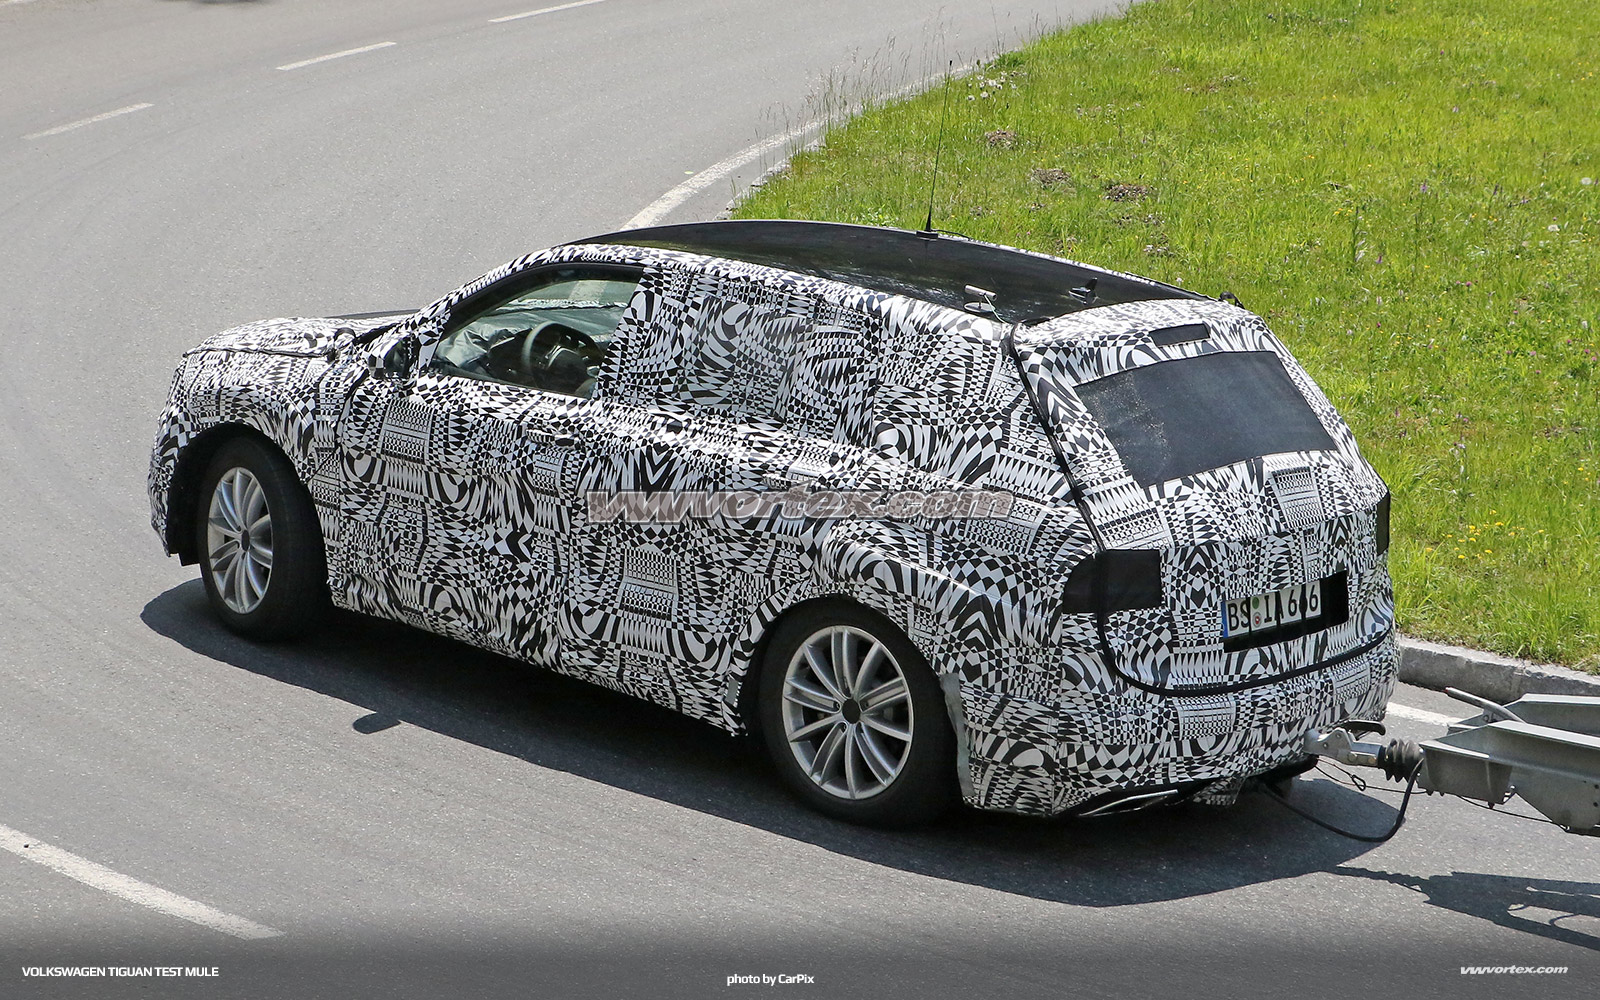 Audi Q2 test mule 4923 110x60 photo